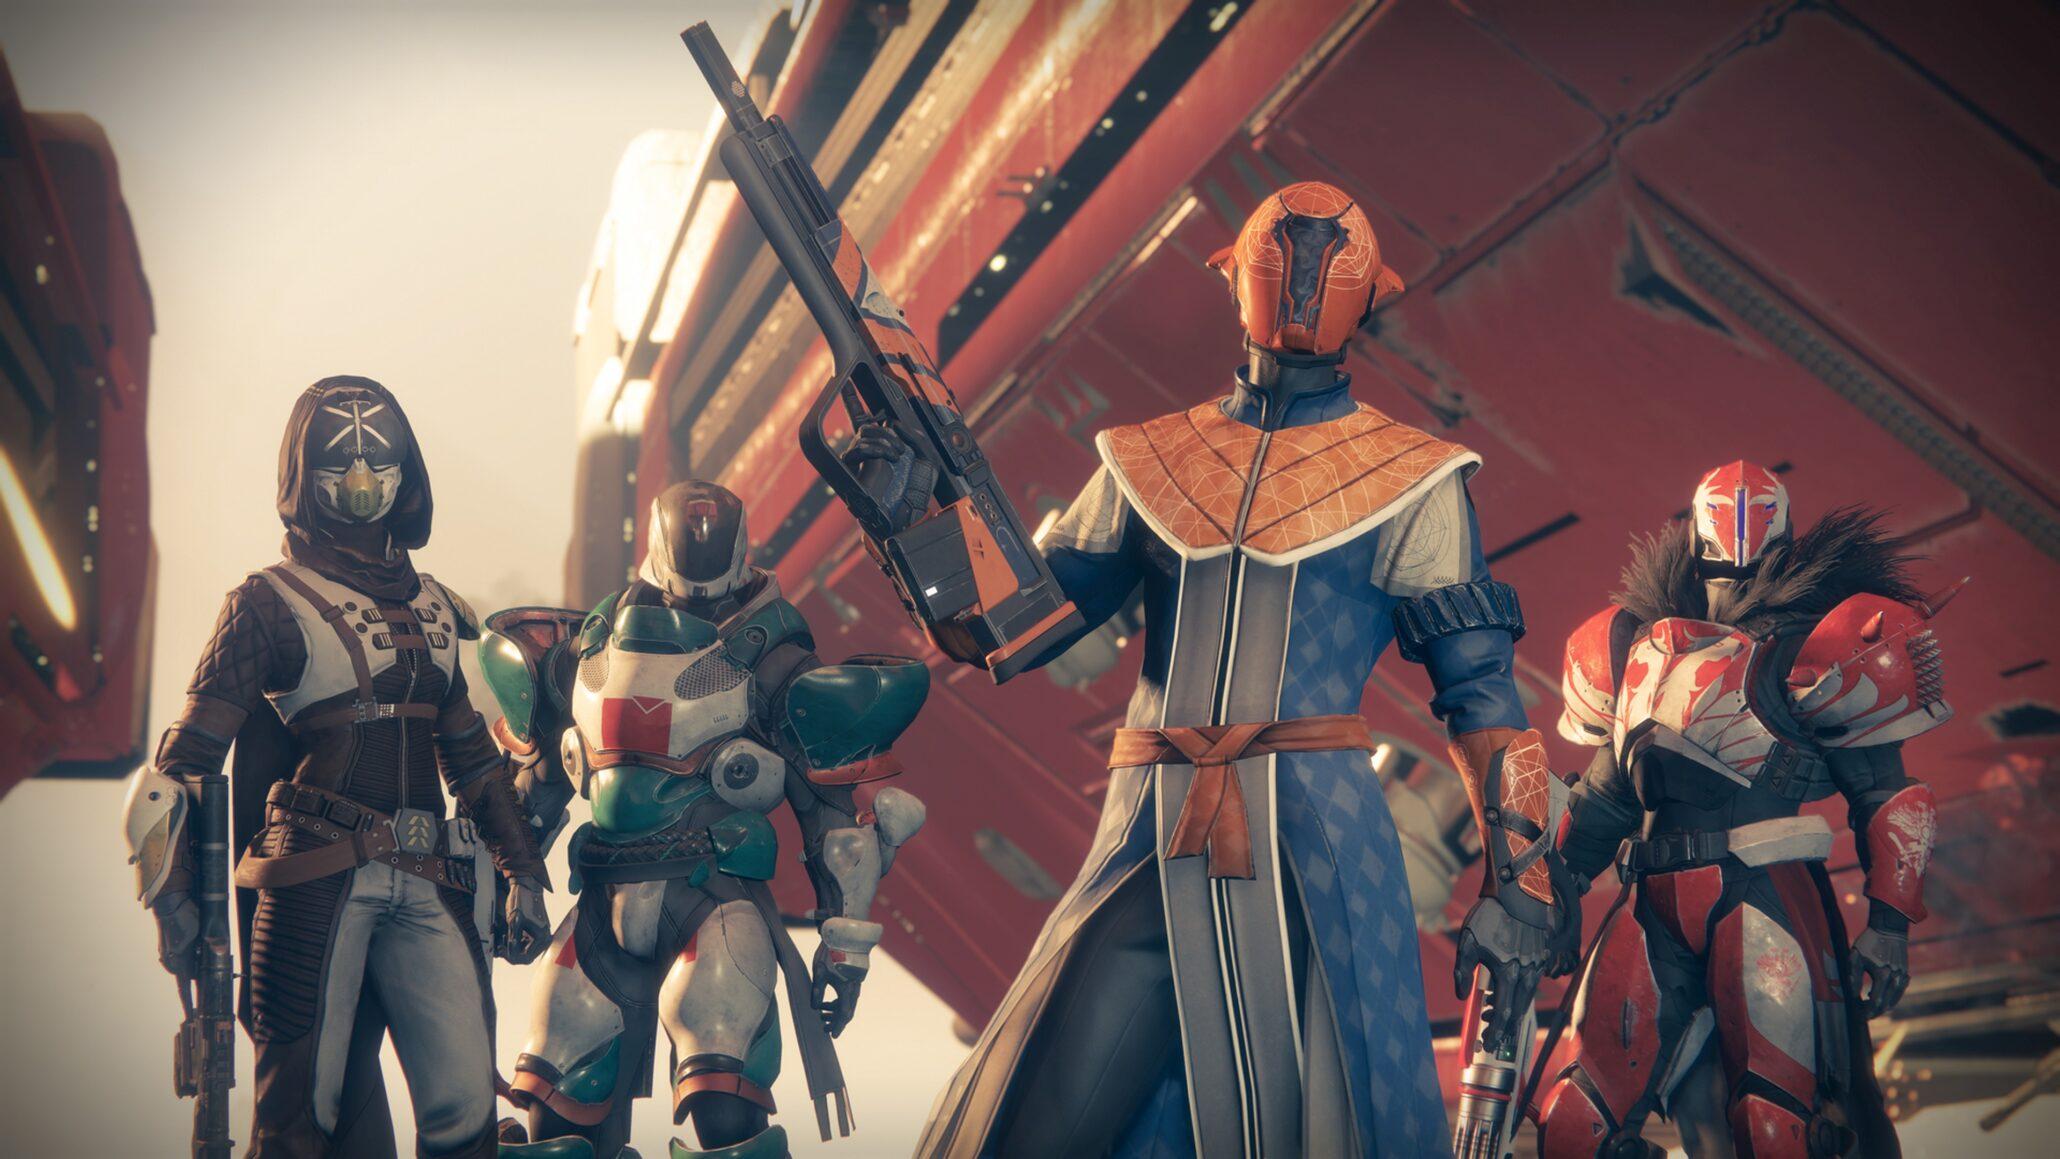 destiny 2 how to find fireteam for nightfall